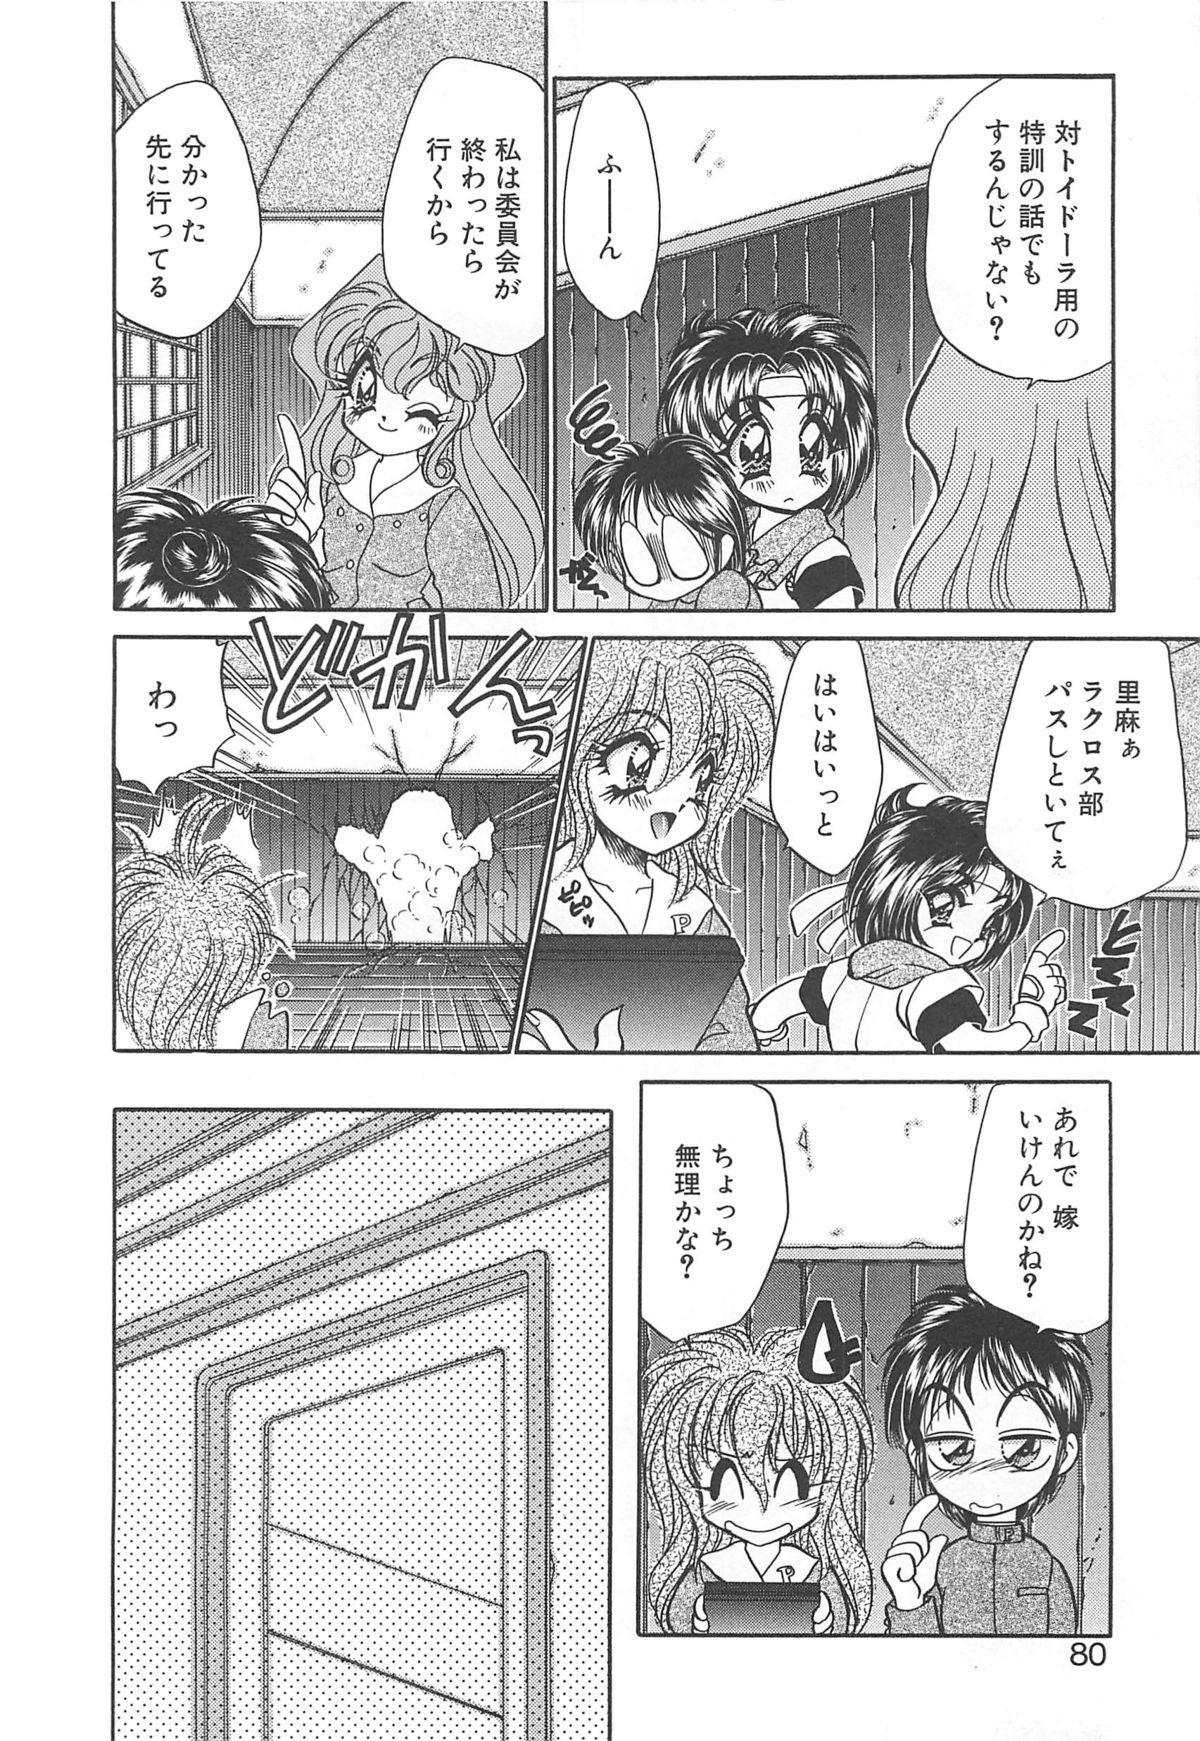 Kigurumi Sentai Quiltian 78